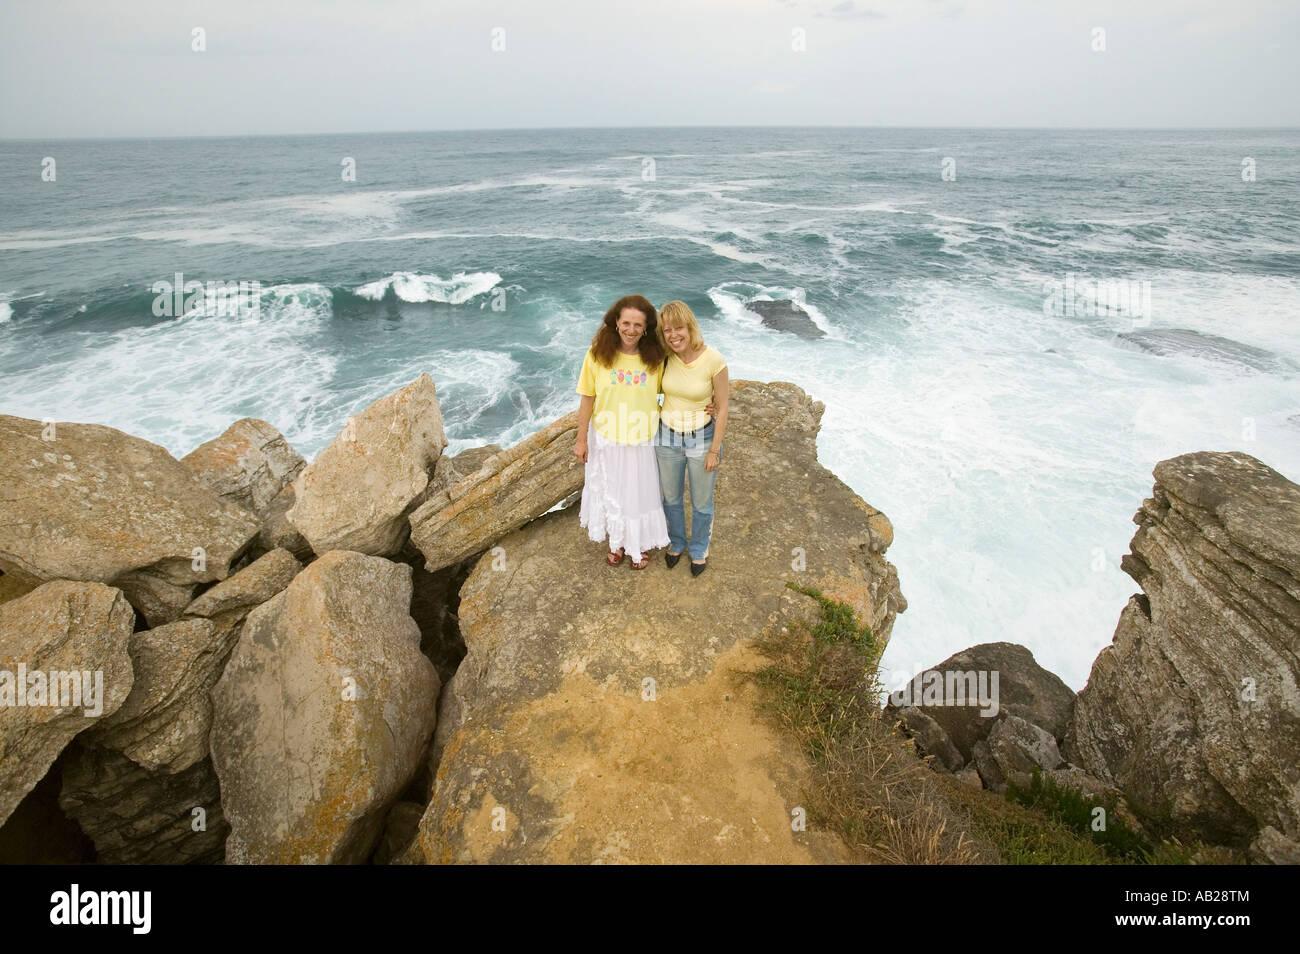 Two women pose at Cruz do Remedios near Peniche west coast of Portugal - Stock Image